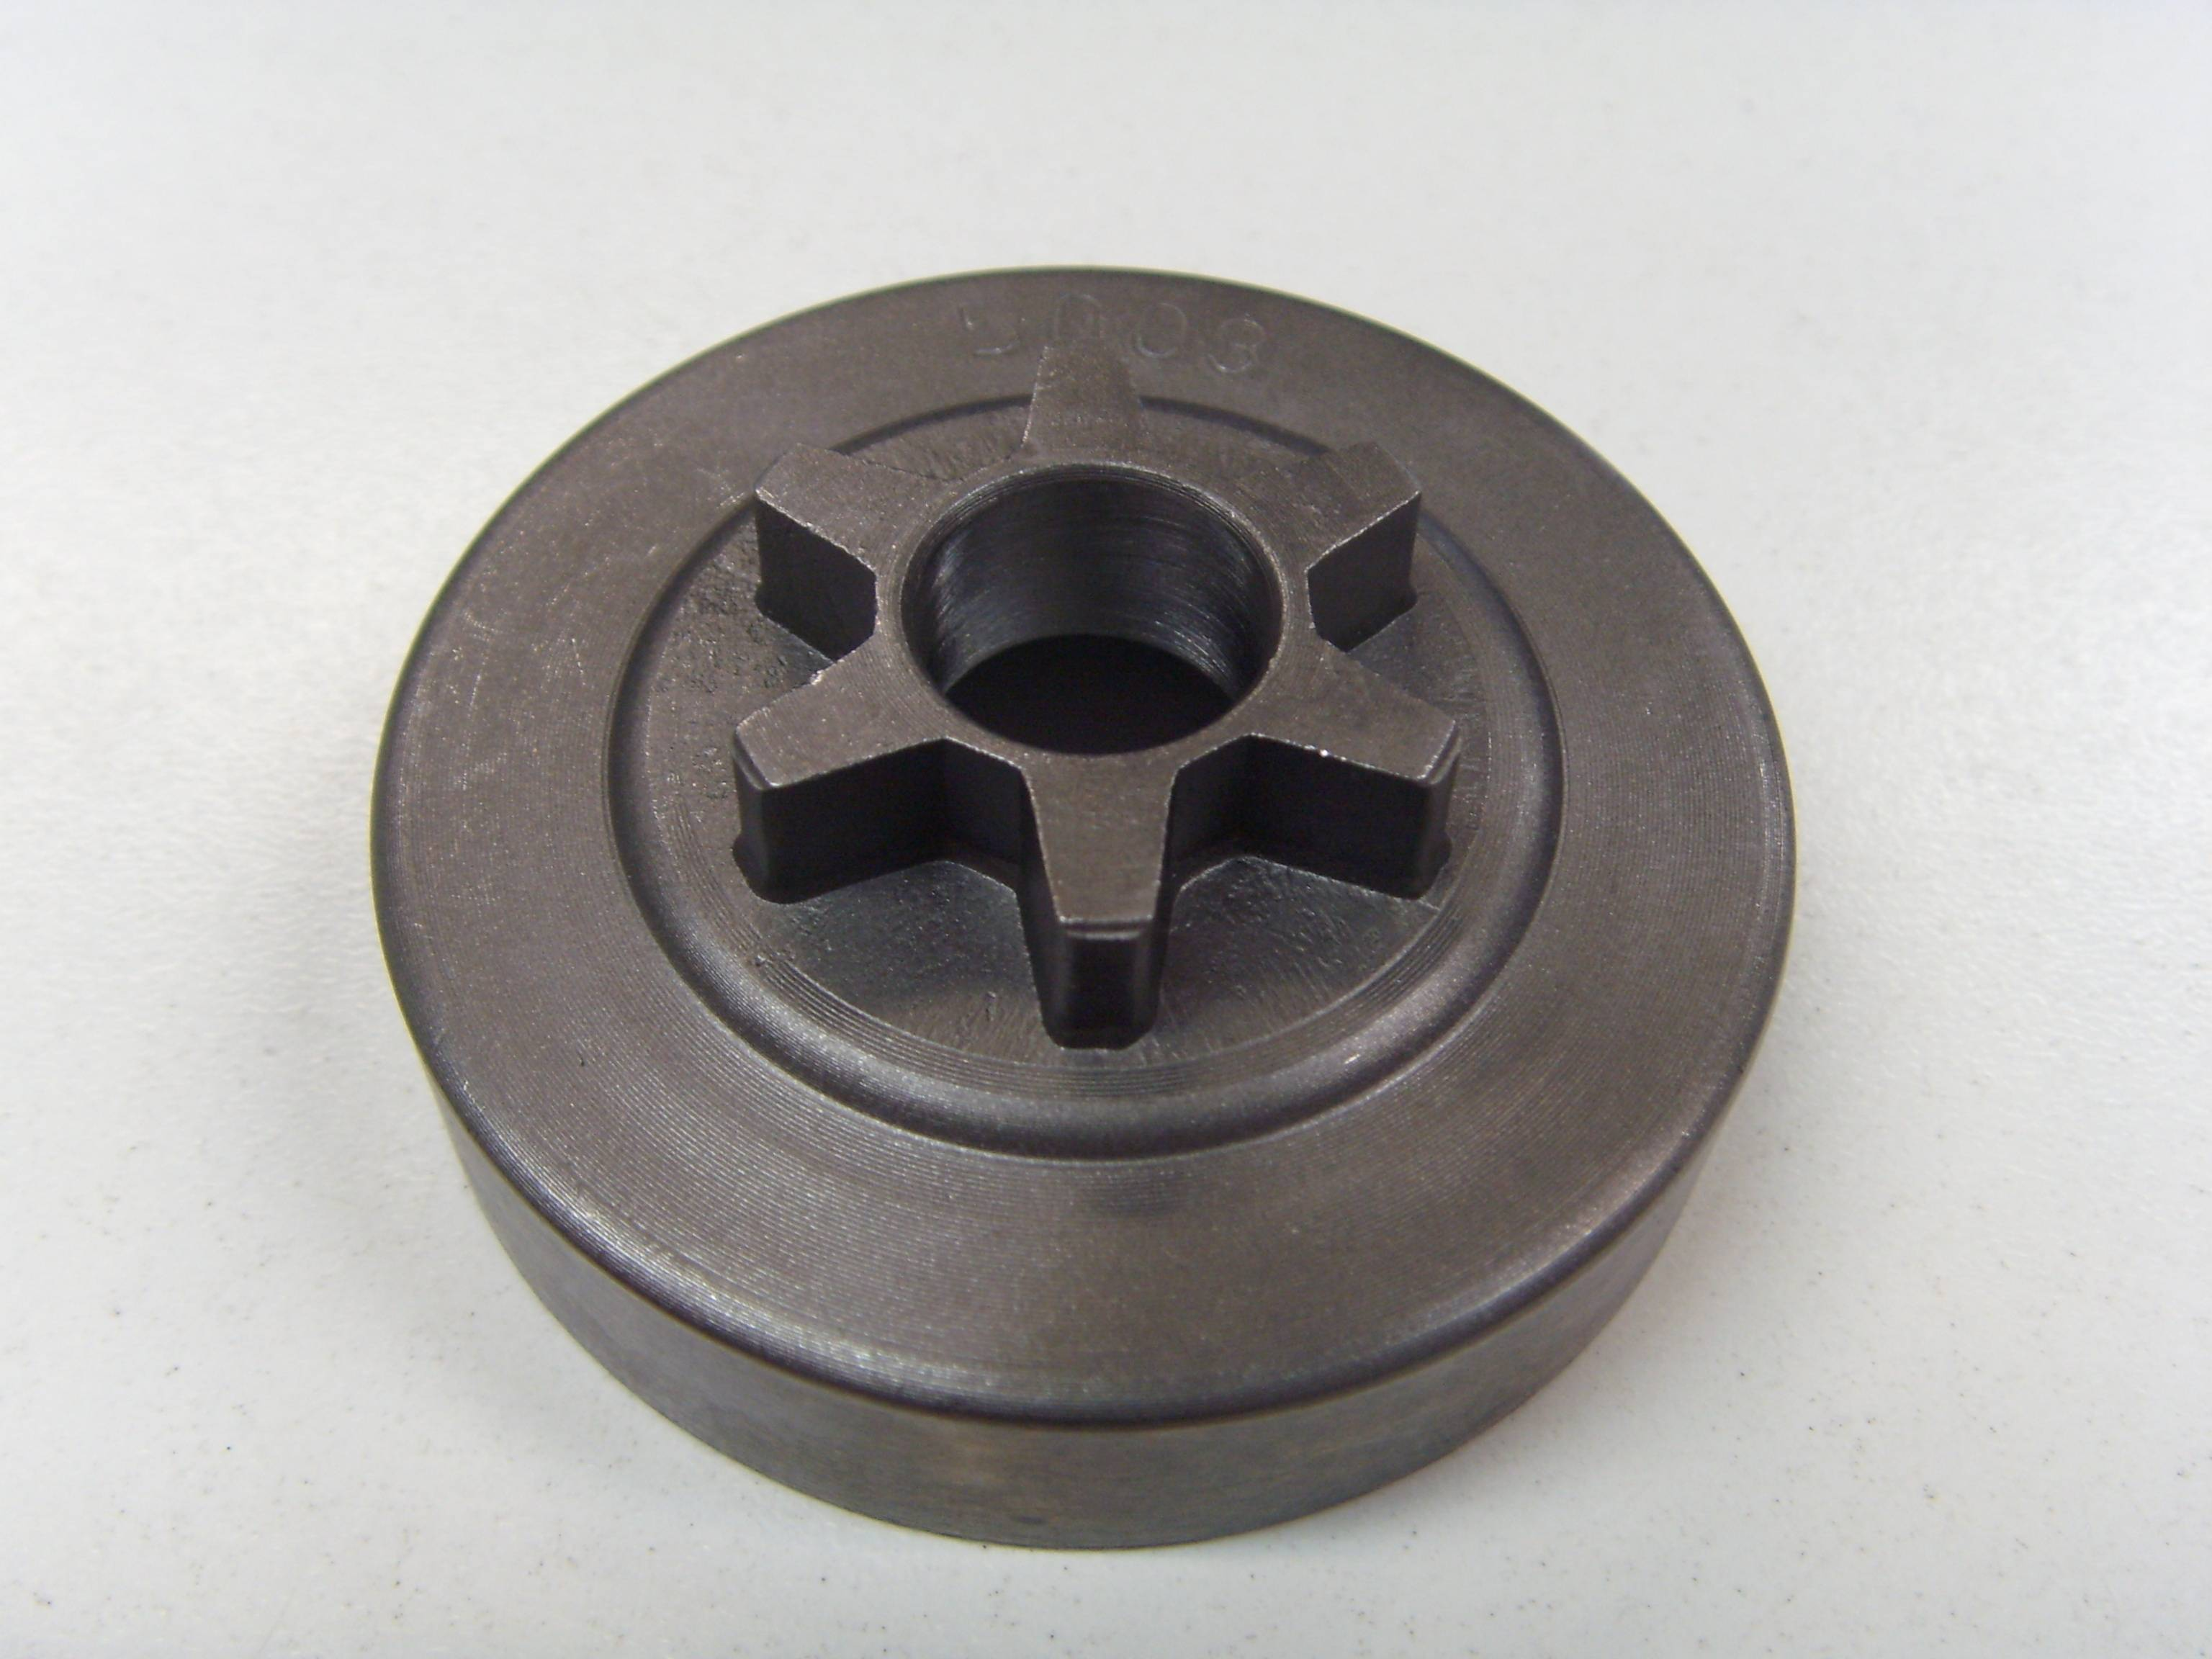 Acero inoxidable binderinge spacer anillos oval 6,5x10mm 10//50 trozo serajosy